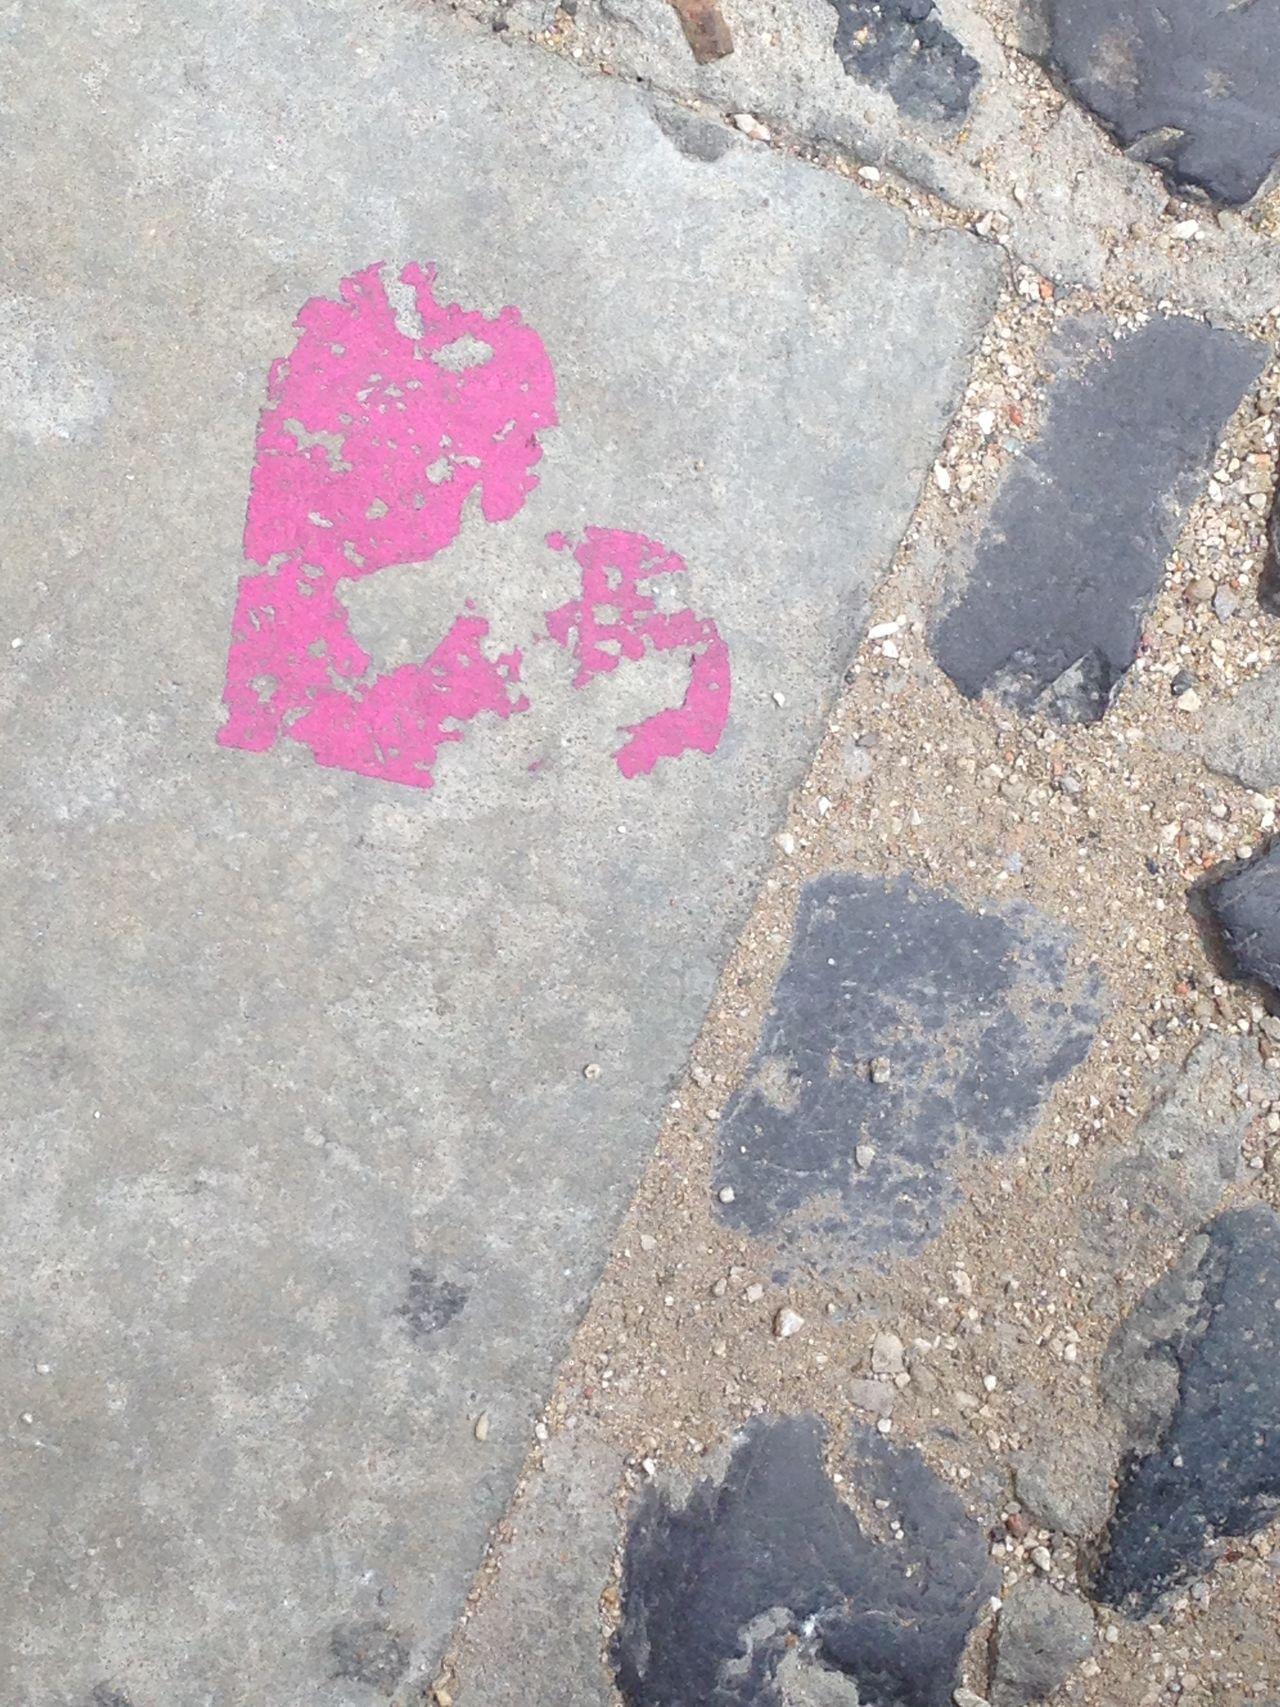 Lisbon Lx Factory Hearts Heartshaped Streetphotography Streetart IPhoneography LisbonLove